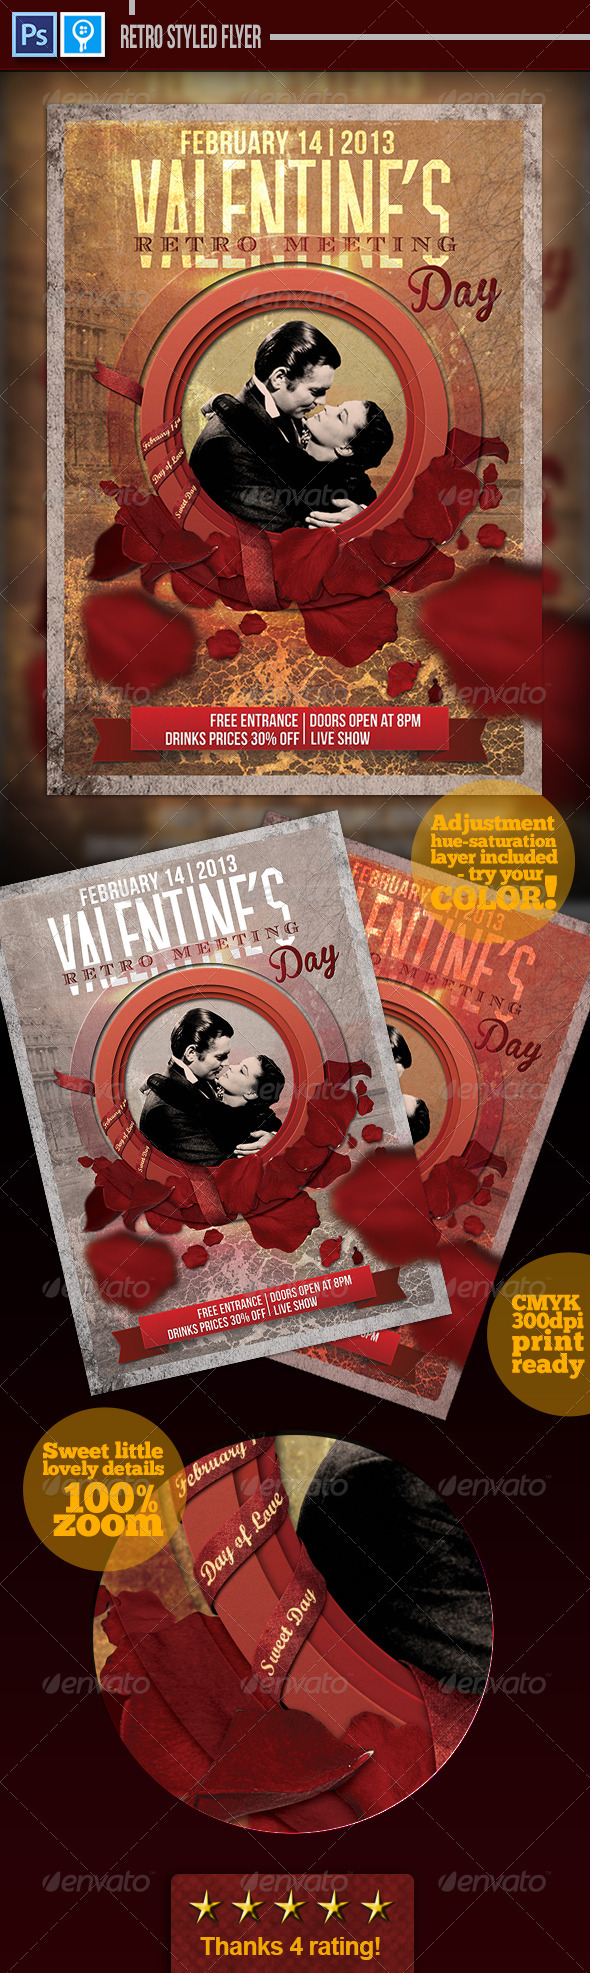 GraphicRiver Retro Valentines Day Flyer 3834743